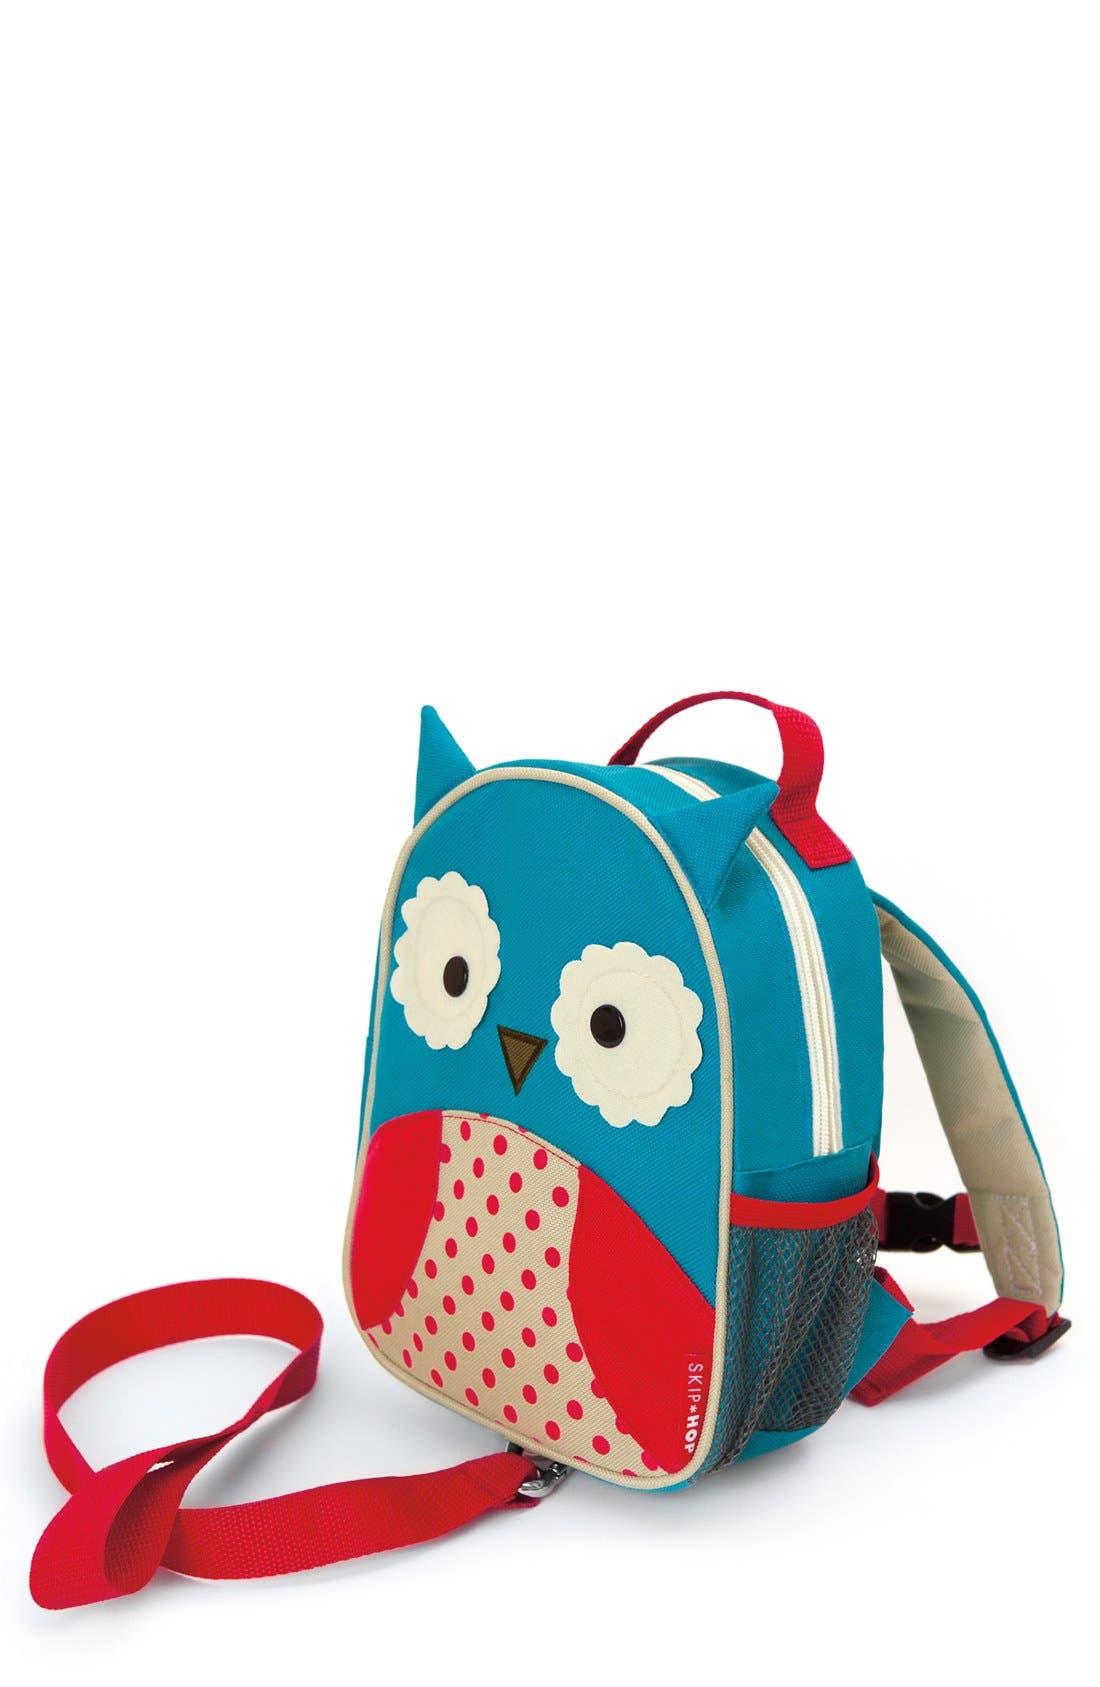 Alternate Image 1 Selected - Skip Hop 'Zoo' Safety Harness Backpack (Kids)